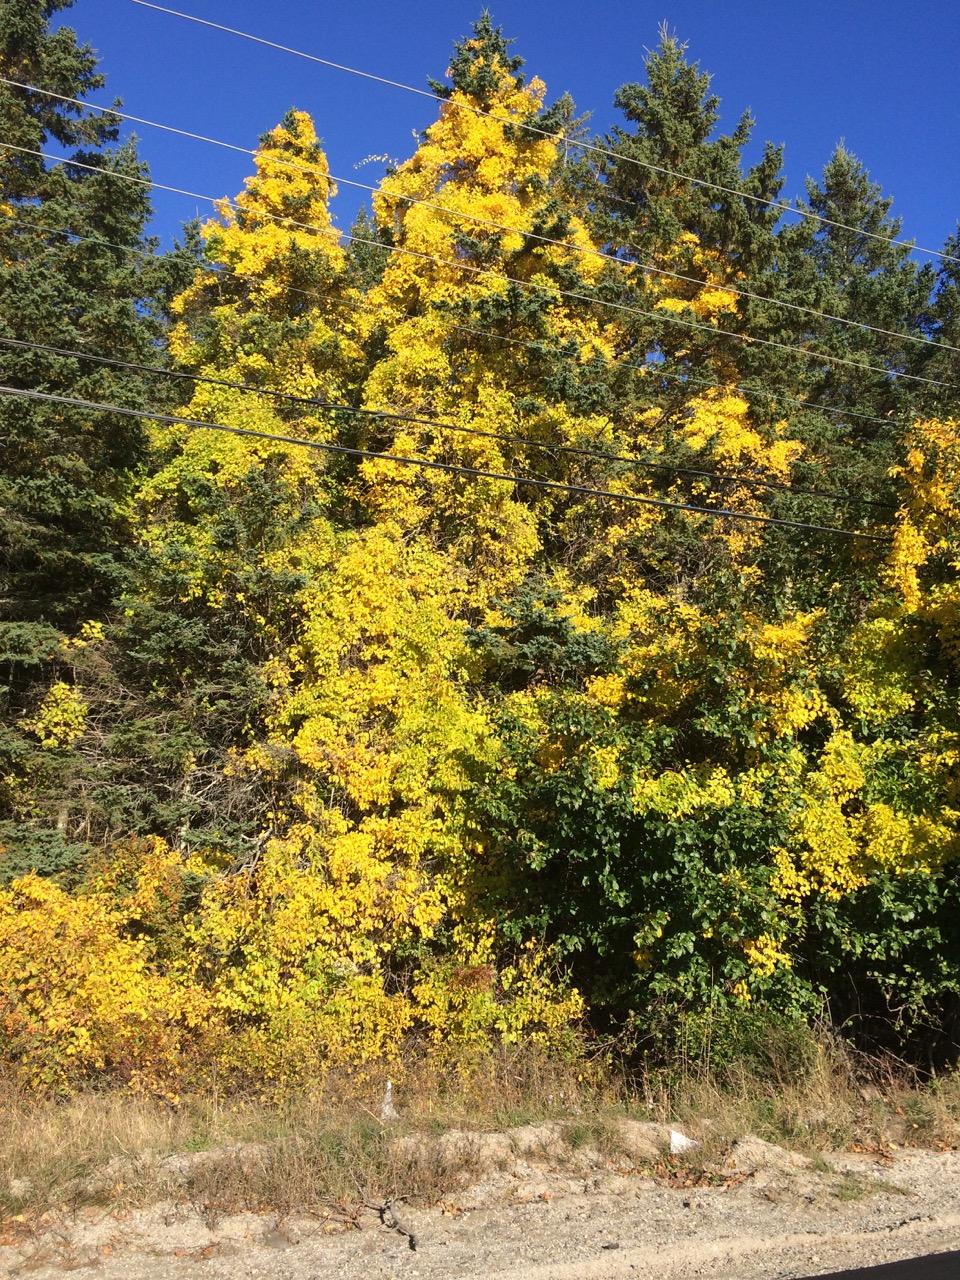 Bittersweet climbing a spruce